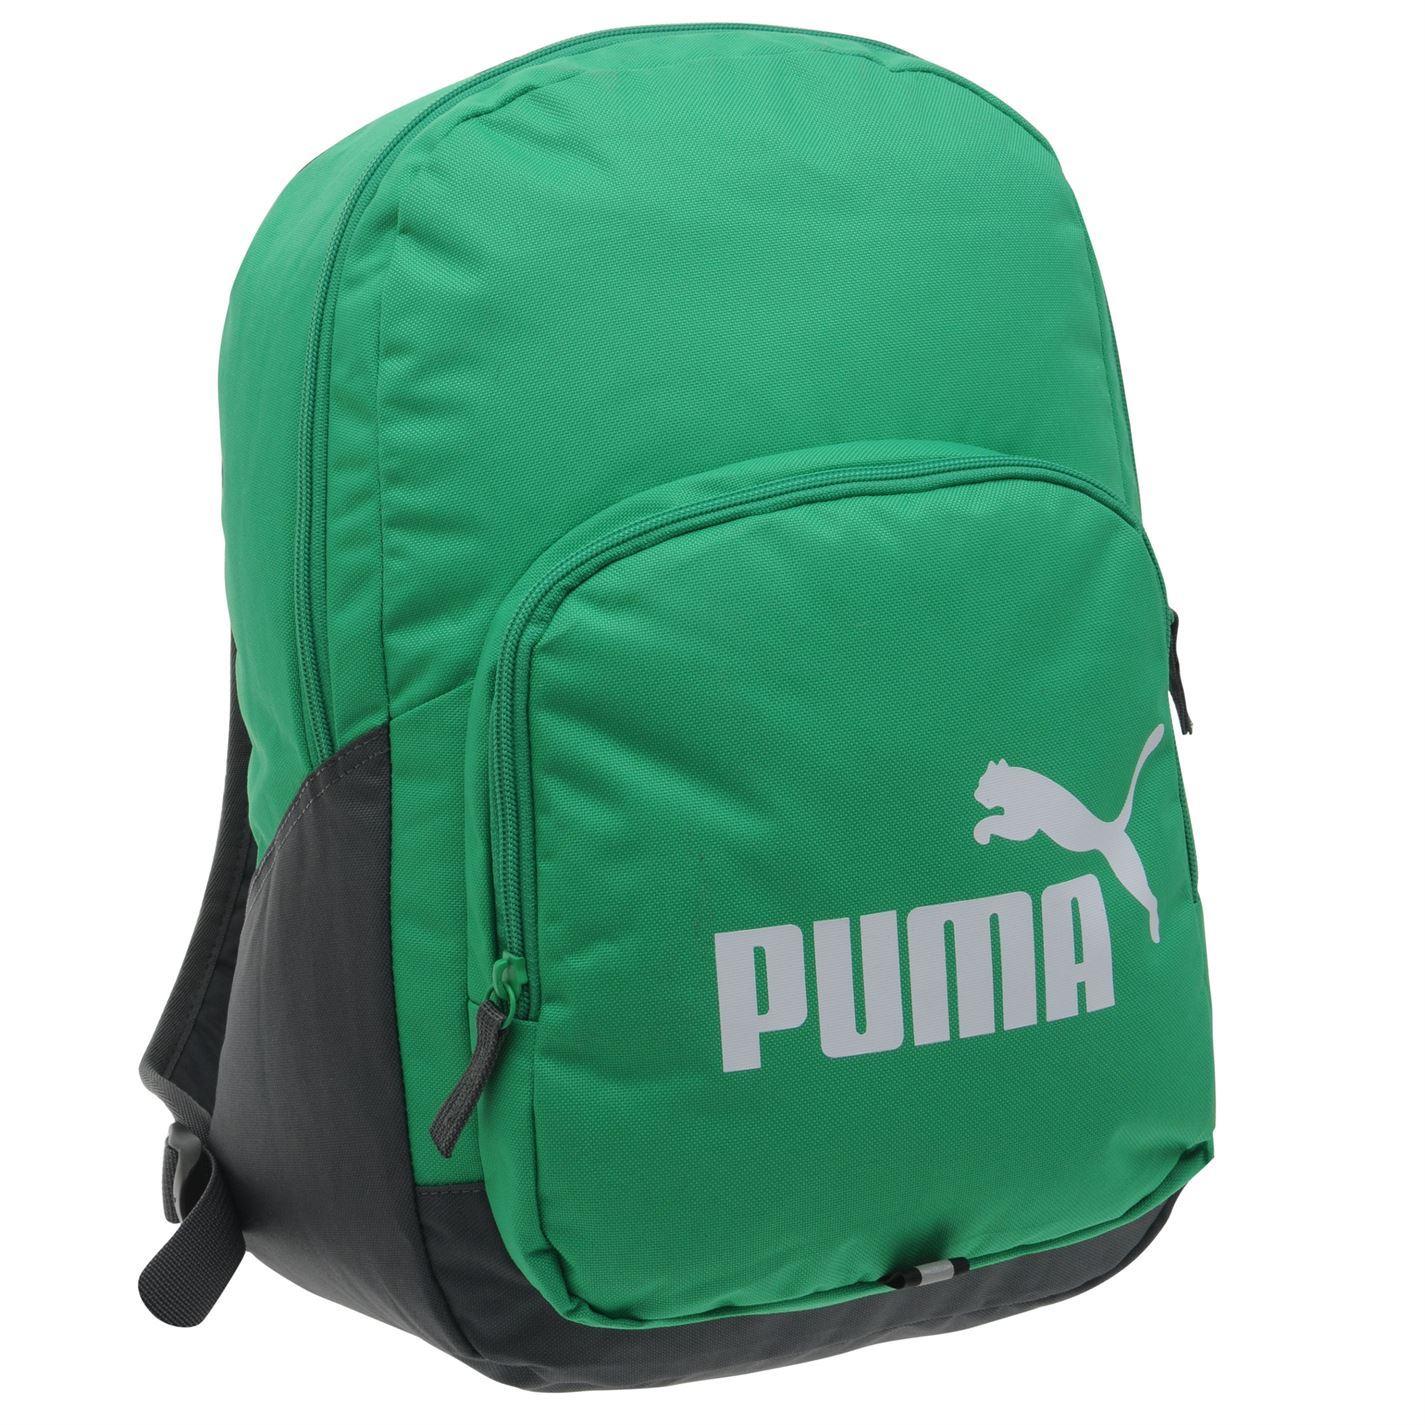 c2eabd4c0 Details about Puma Phase Backpack Green/White Bag Rucksack Holdall Carryall